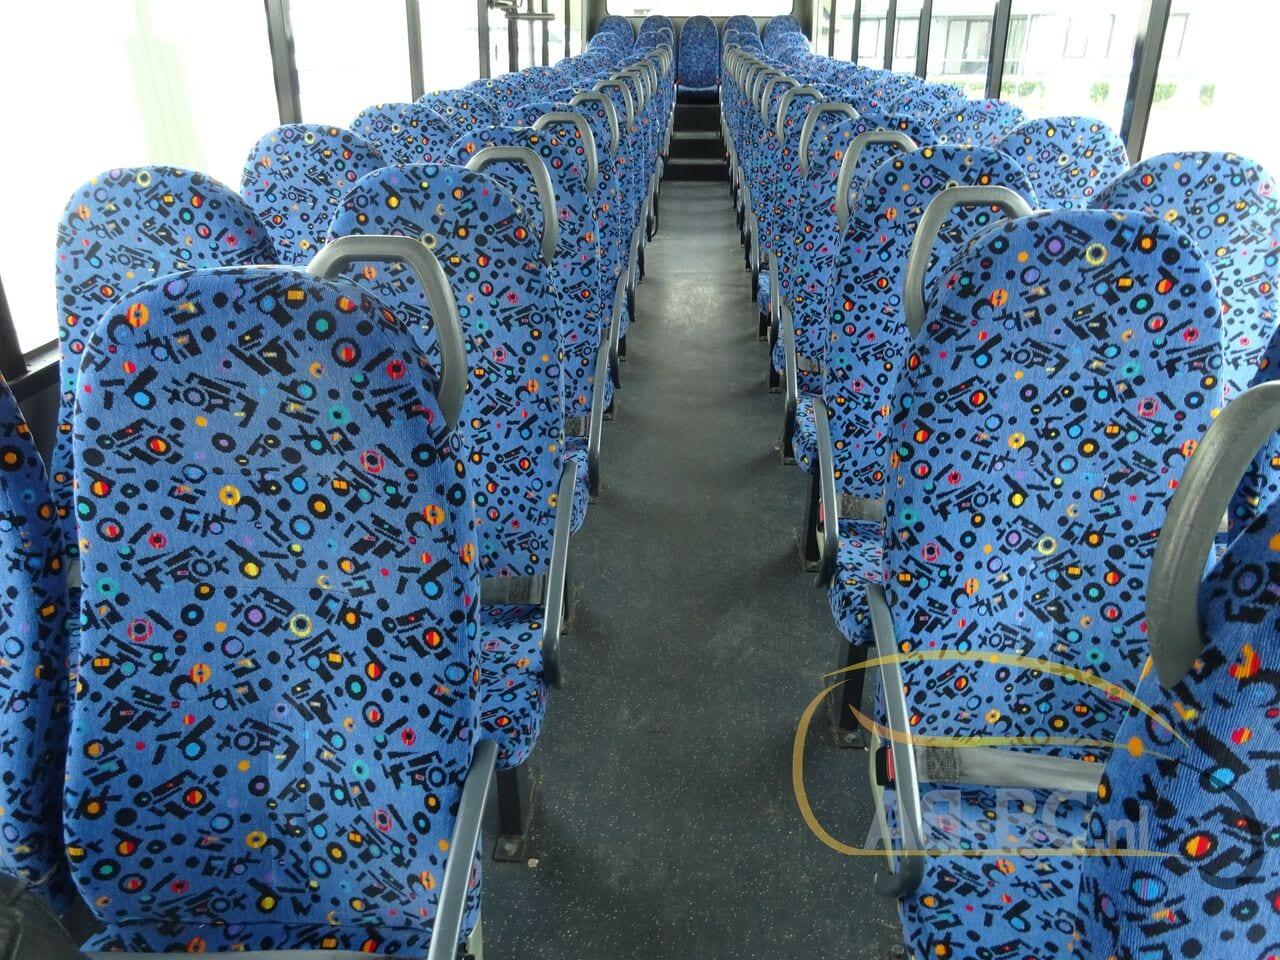 interurban-busMAN-Fast-64-seats---1619619961422172519_big_78820cff2bf89760c260efe55045093f--21042817163019598600